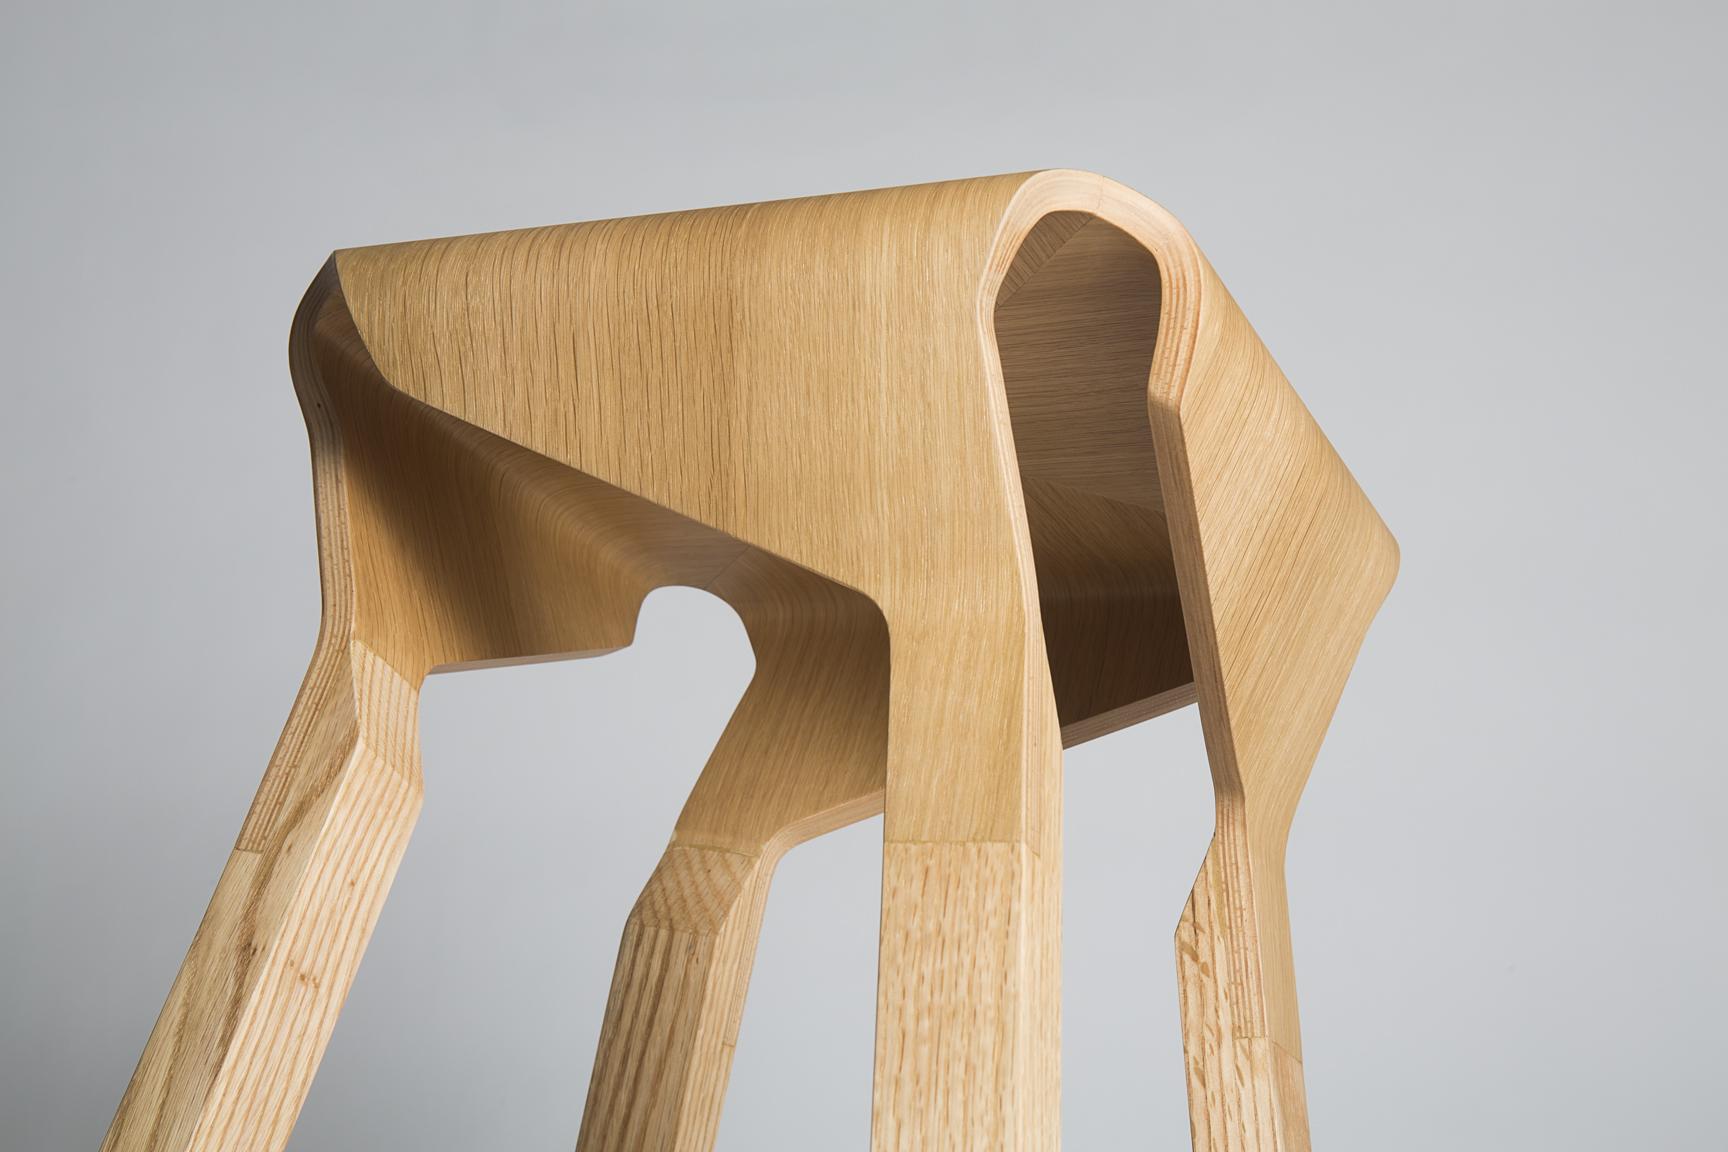 Taburete Naoshima, Emiliana Design Studio, Barcelona, 2016, © Xavier Padrós